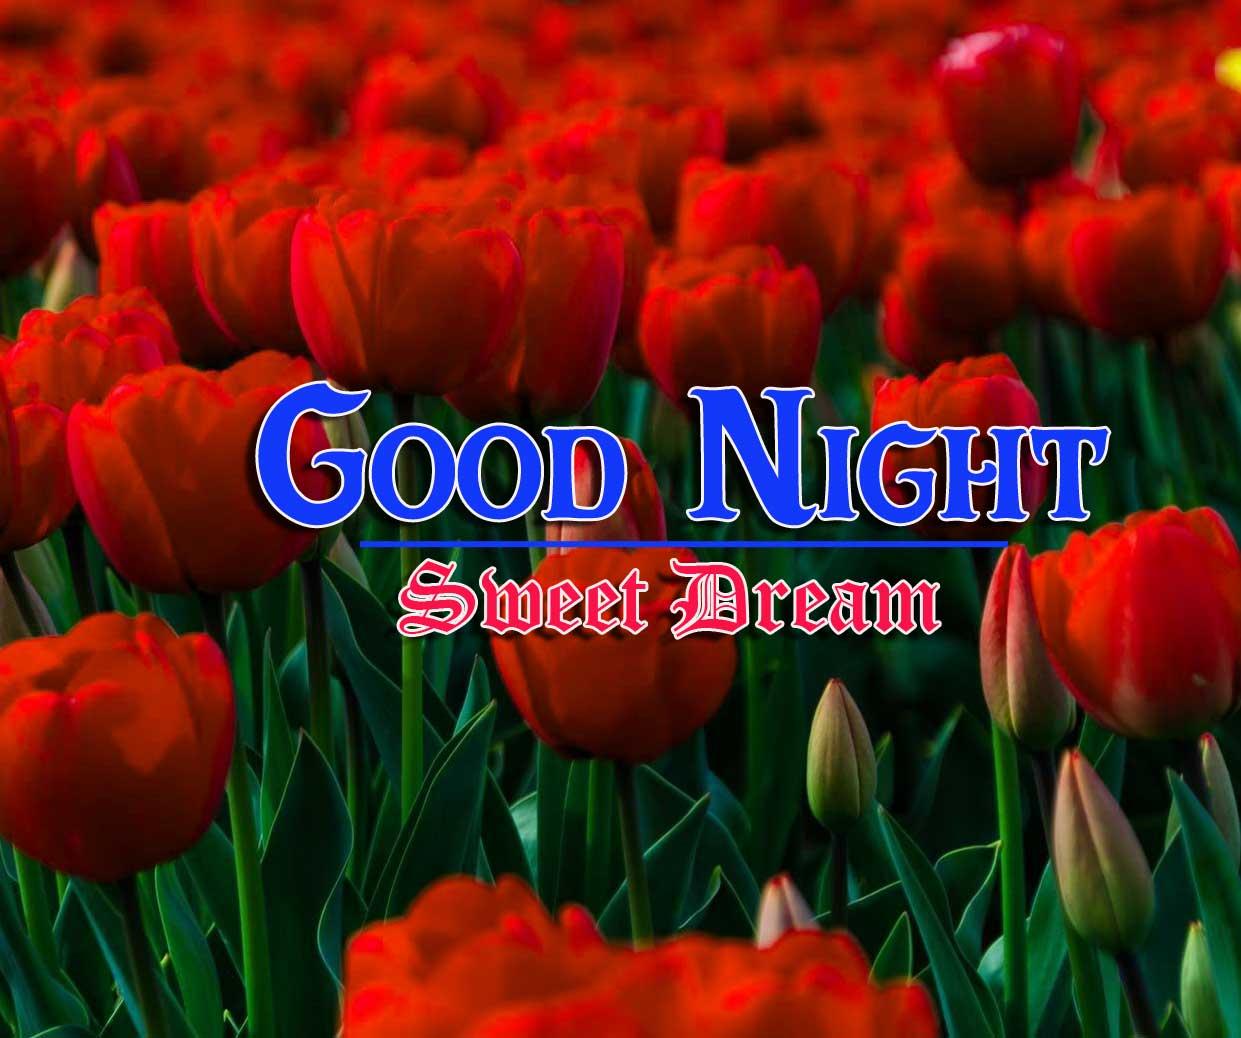 Good Night Images 4k 1080p Pics Wallpaper Free Download